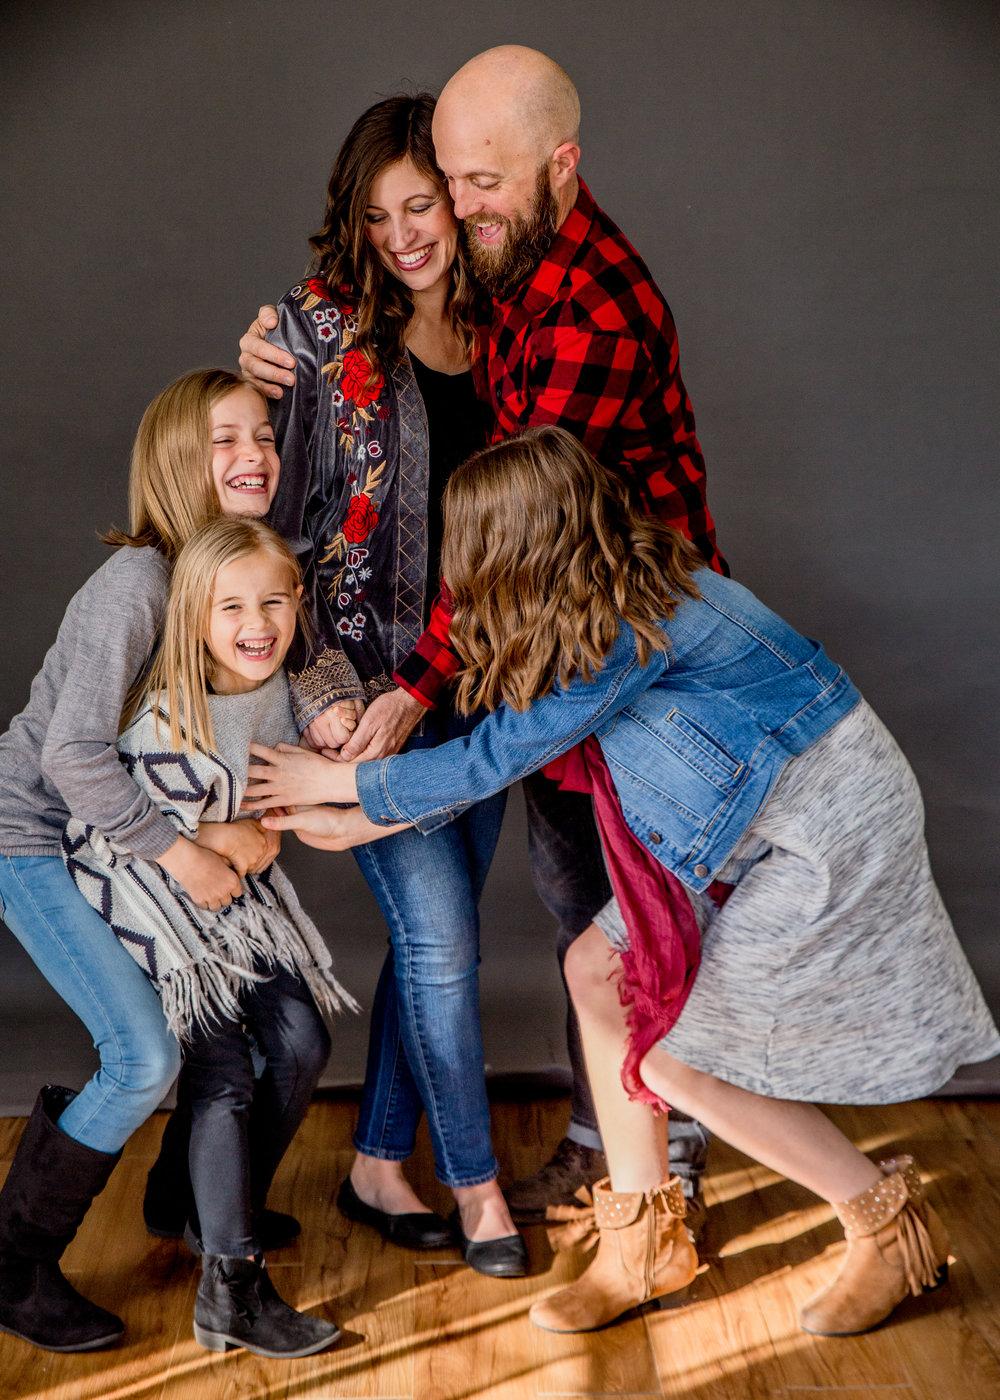 standrodfamily2018-34.jpg